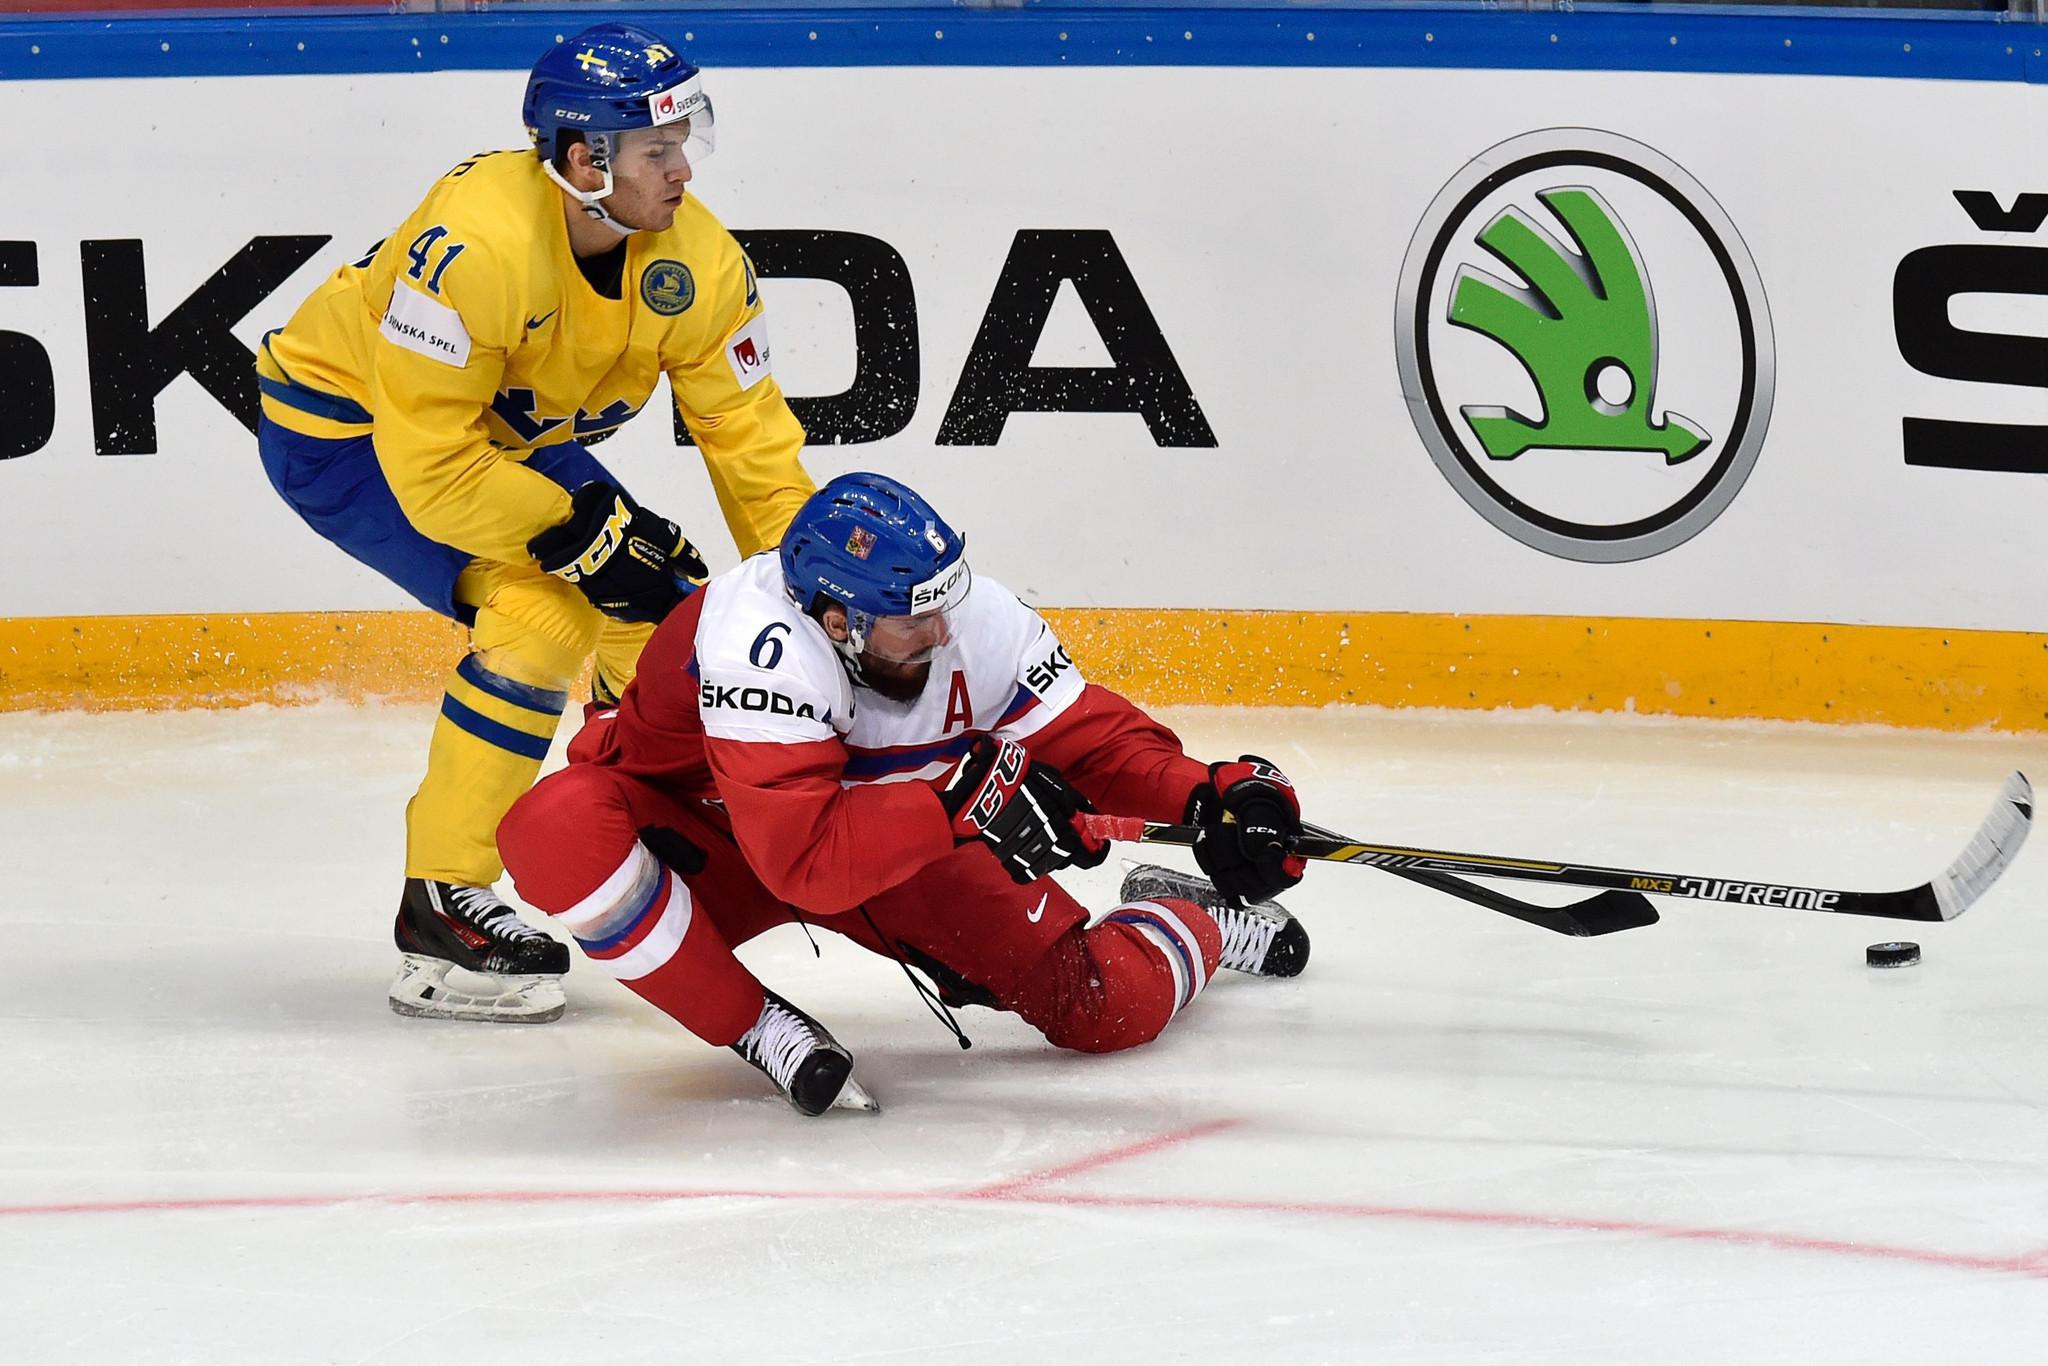 Ct-blackhawks-sign-johansson-kempny-lundberg-20160524